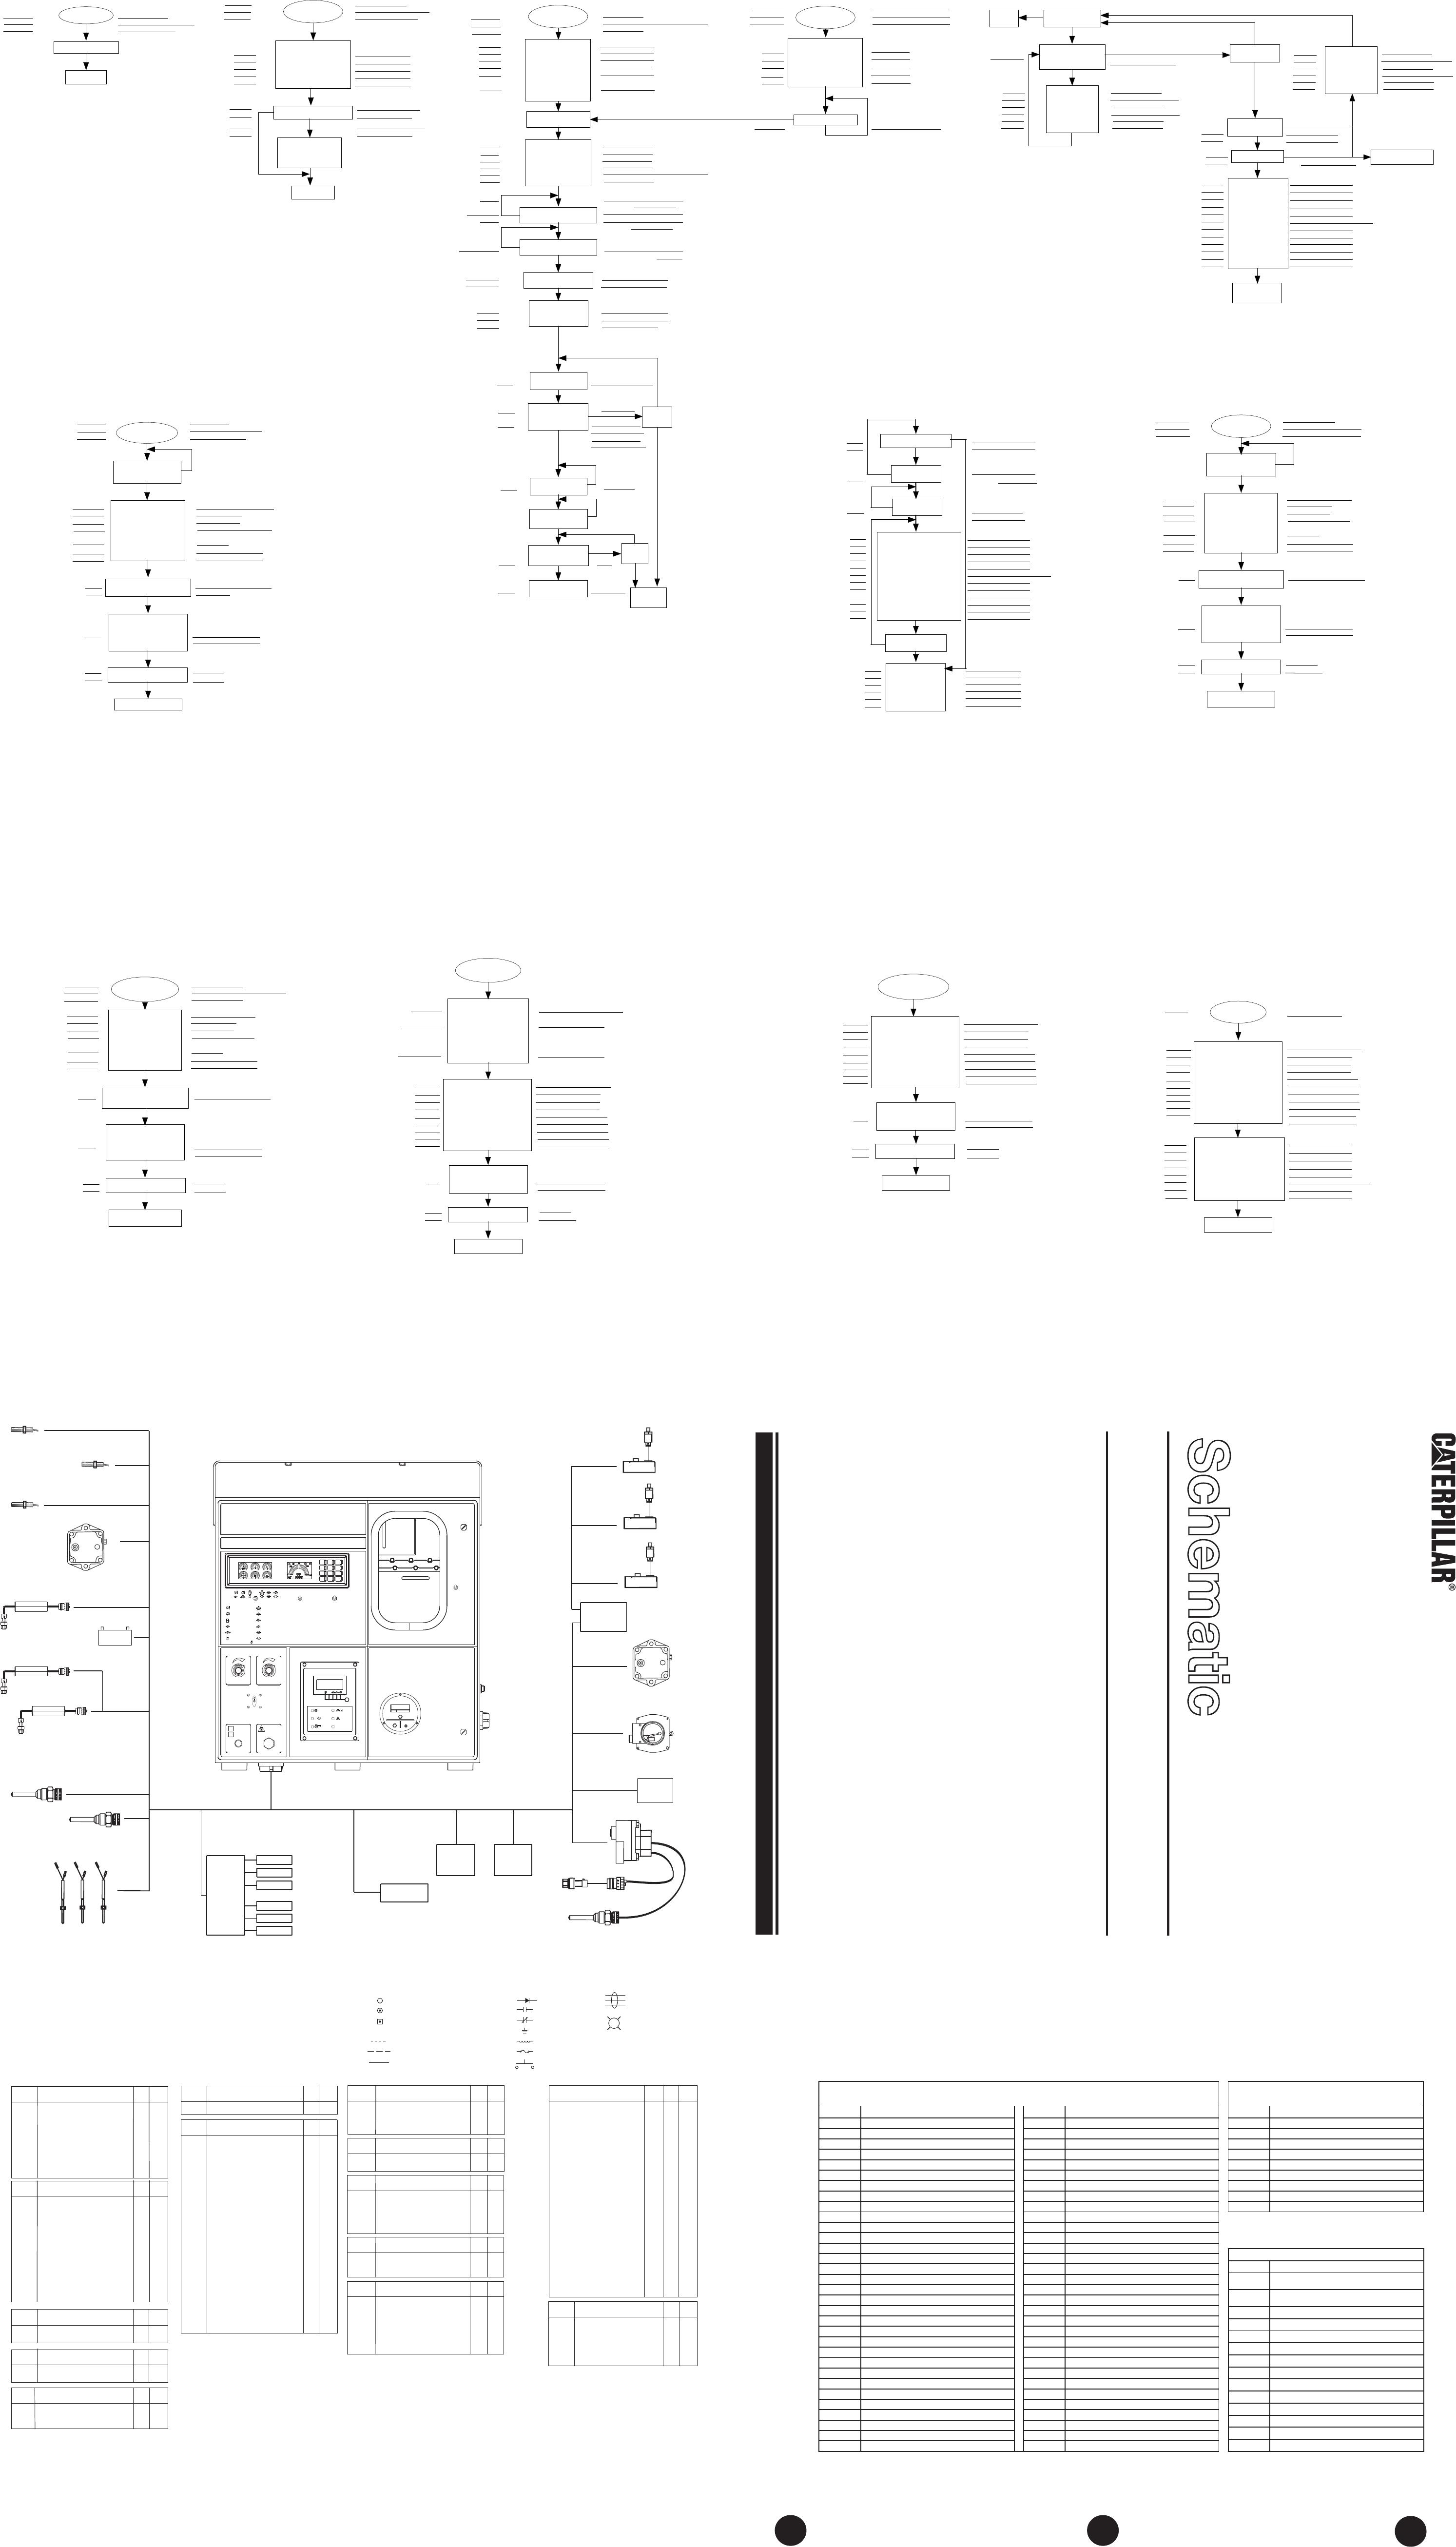 Caterpillar Schematics Diagrams D4h. . Wiring Diagram on